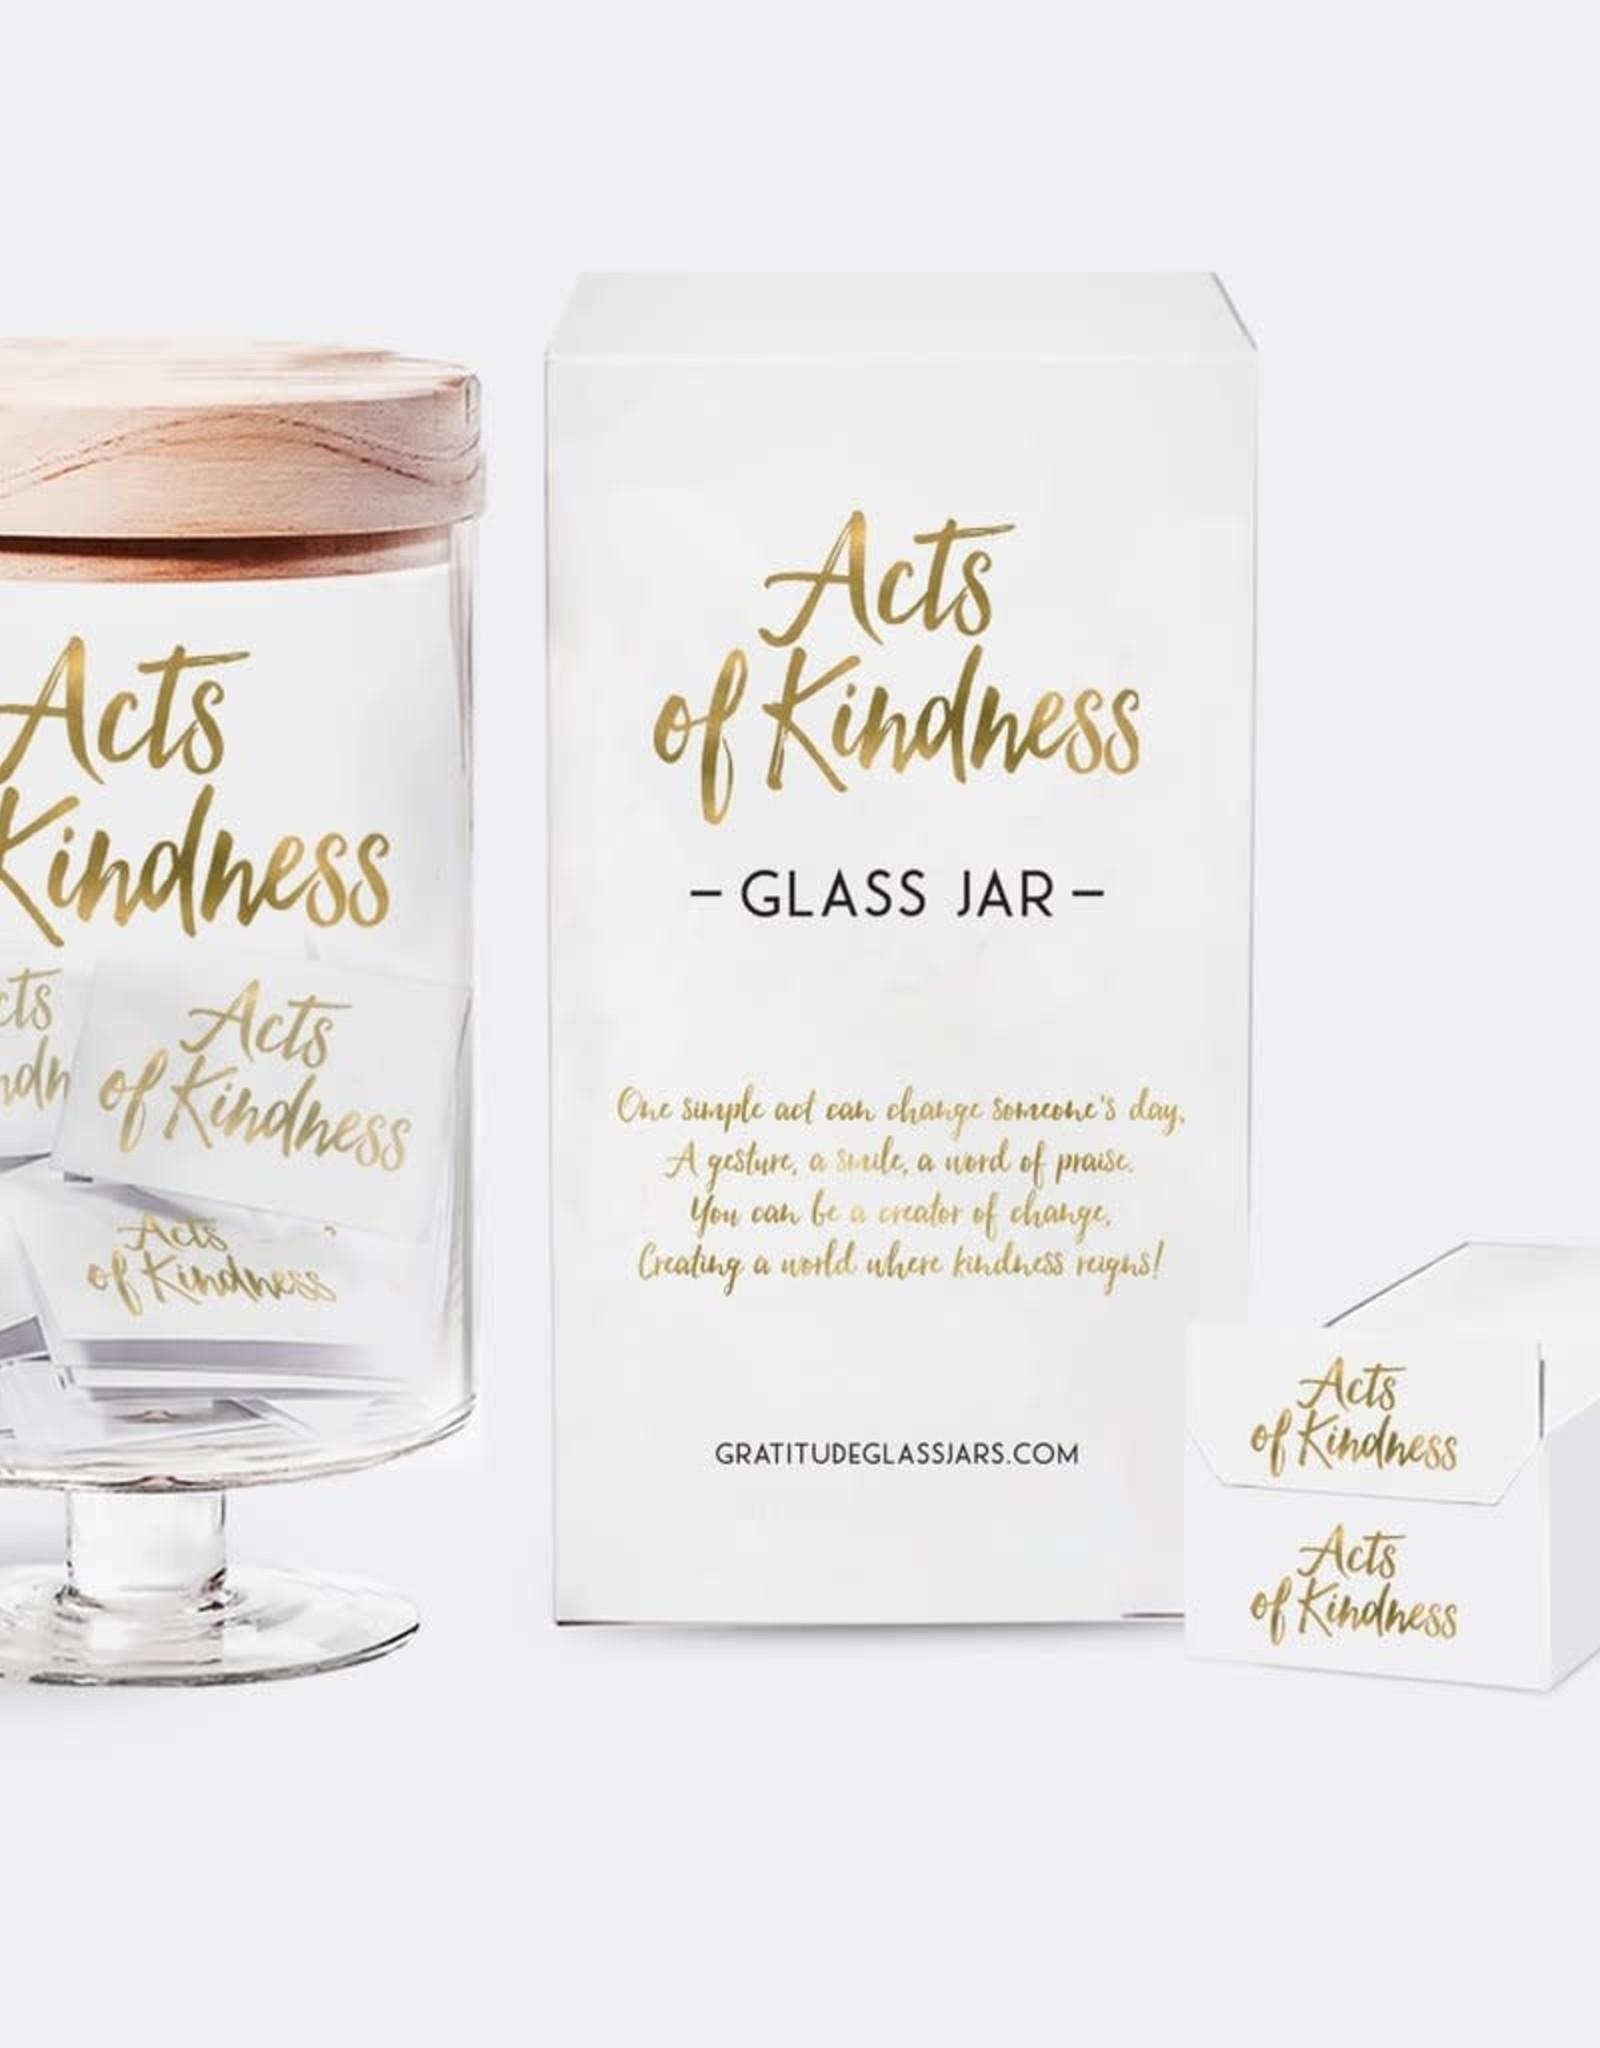 Gratitude Glass Jars Acts of Kindness Glass Jar